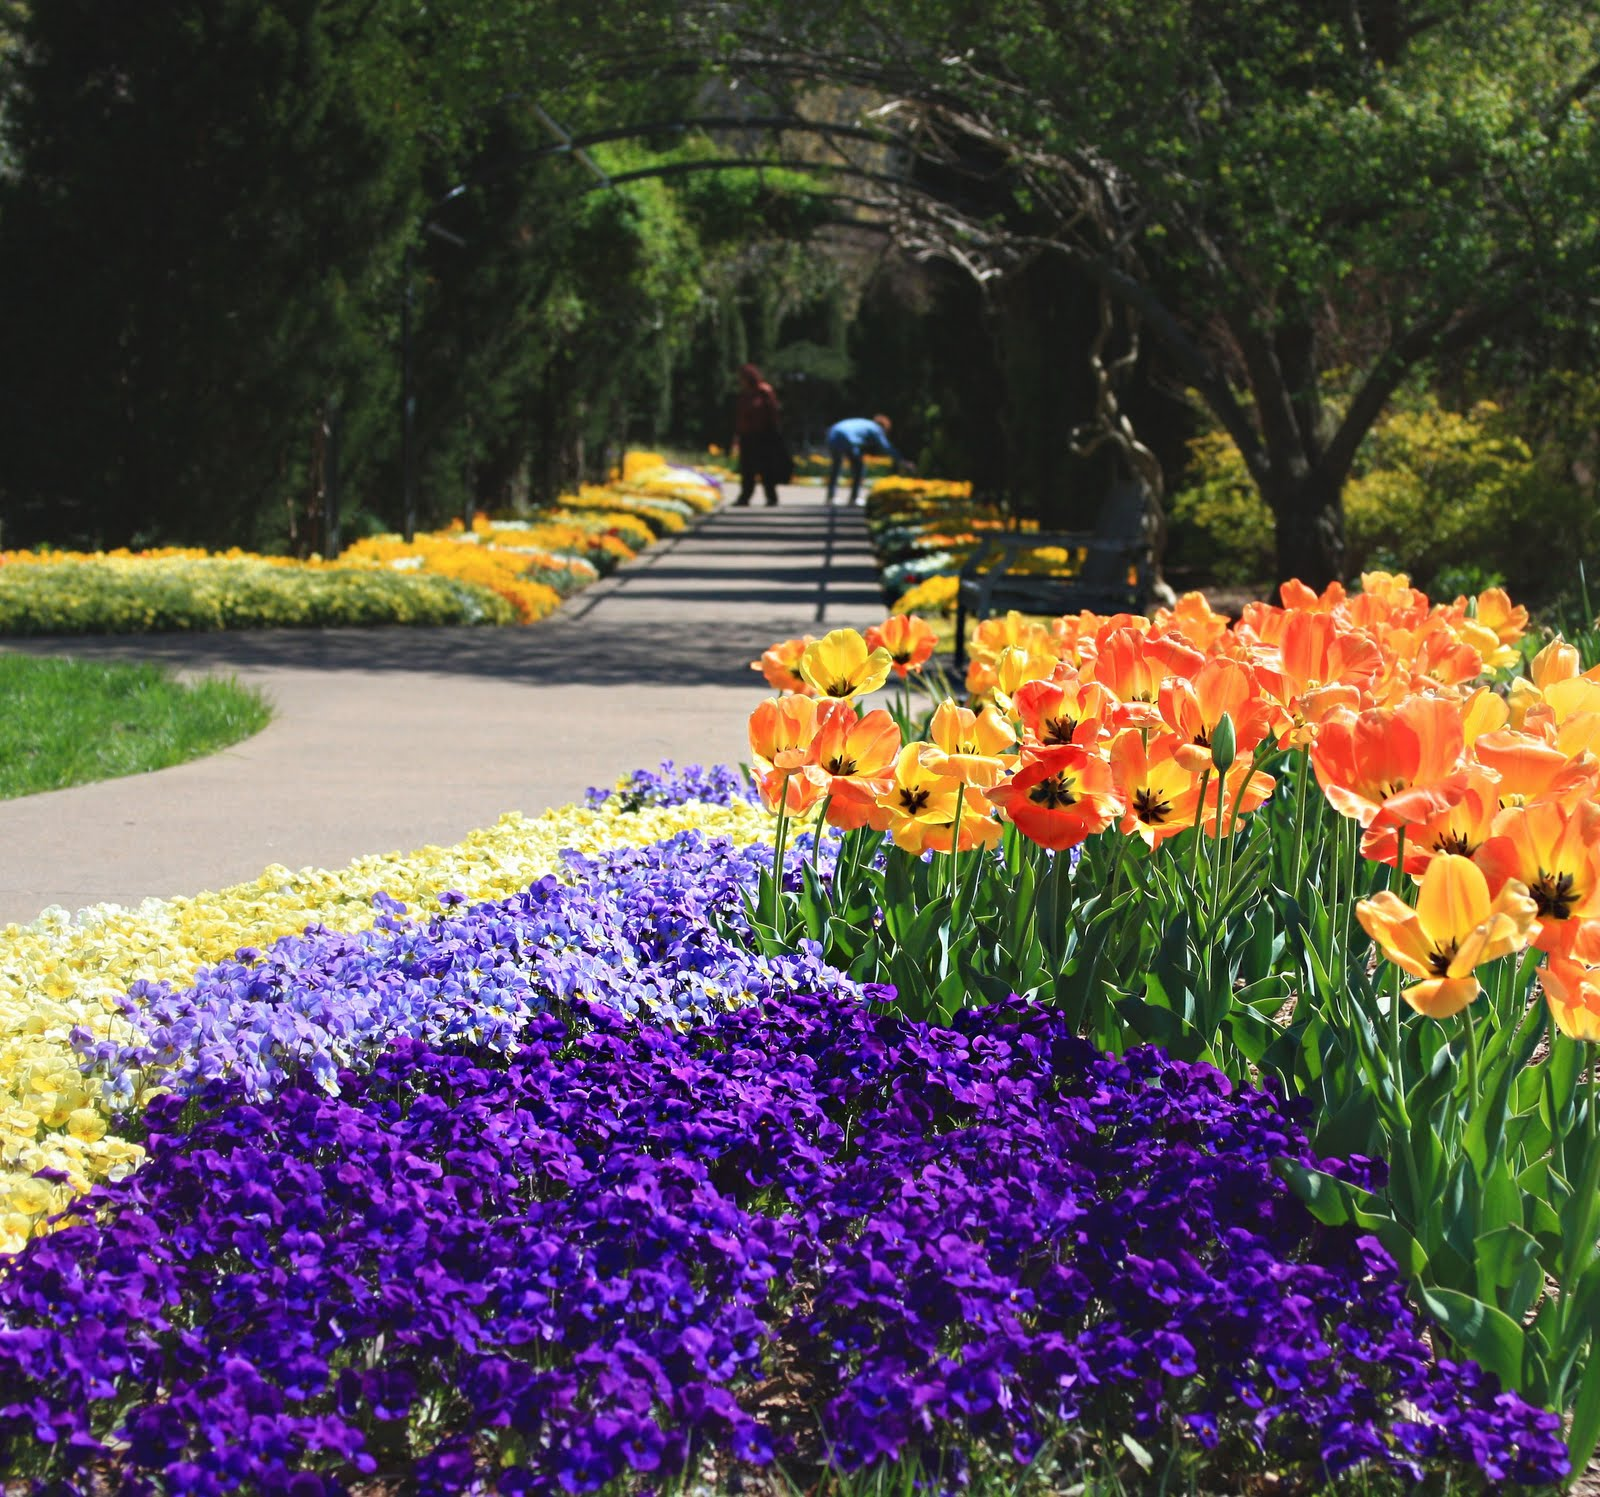 Erin S Art And Gardens Cheekwood Botanical Gardens